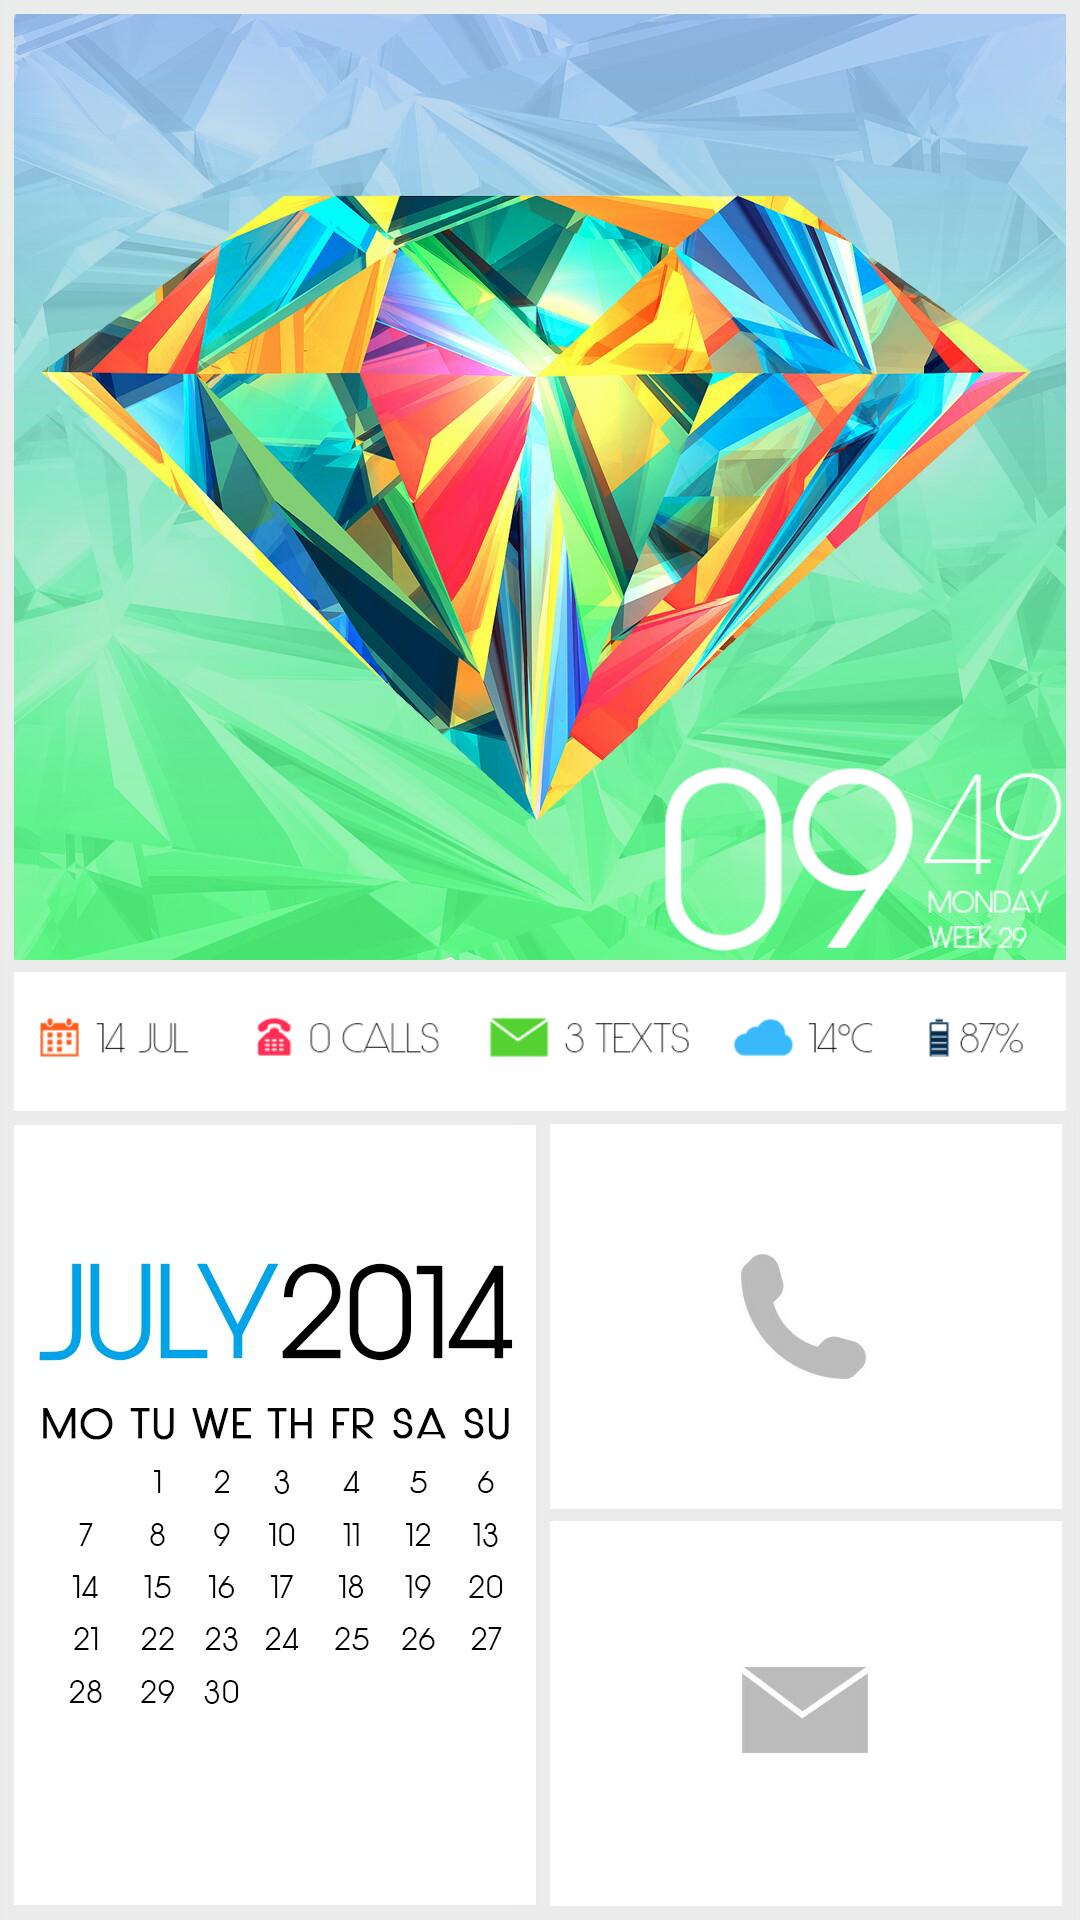 Screenshot_2014-07-14-09-49-42